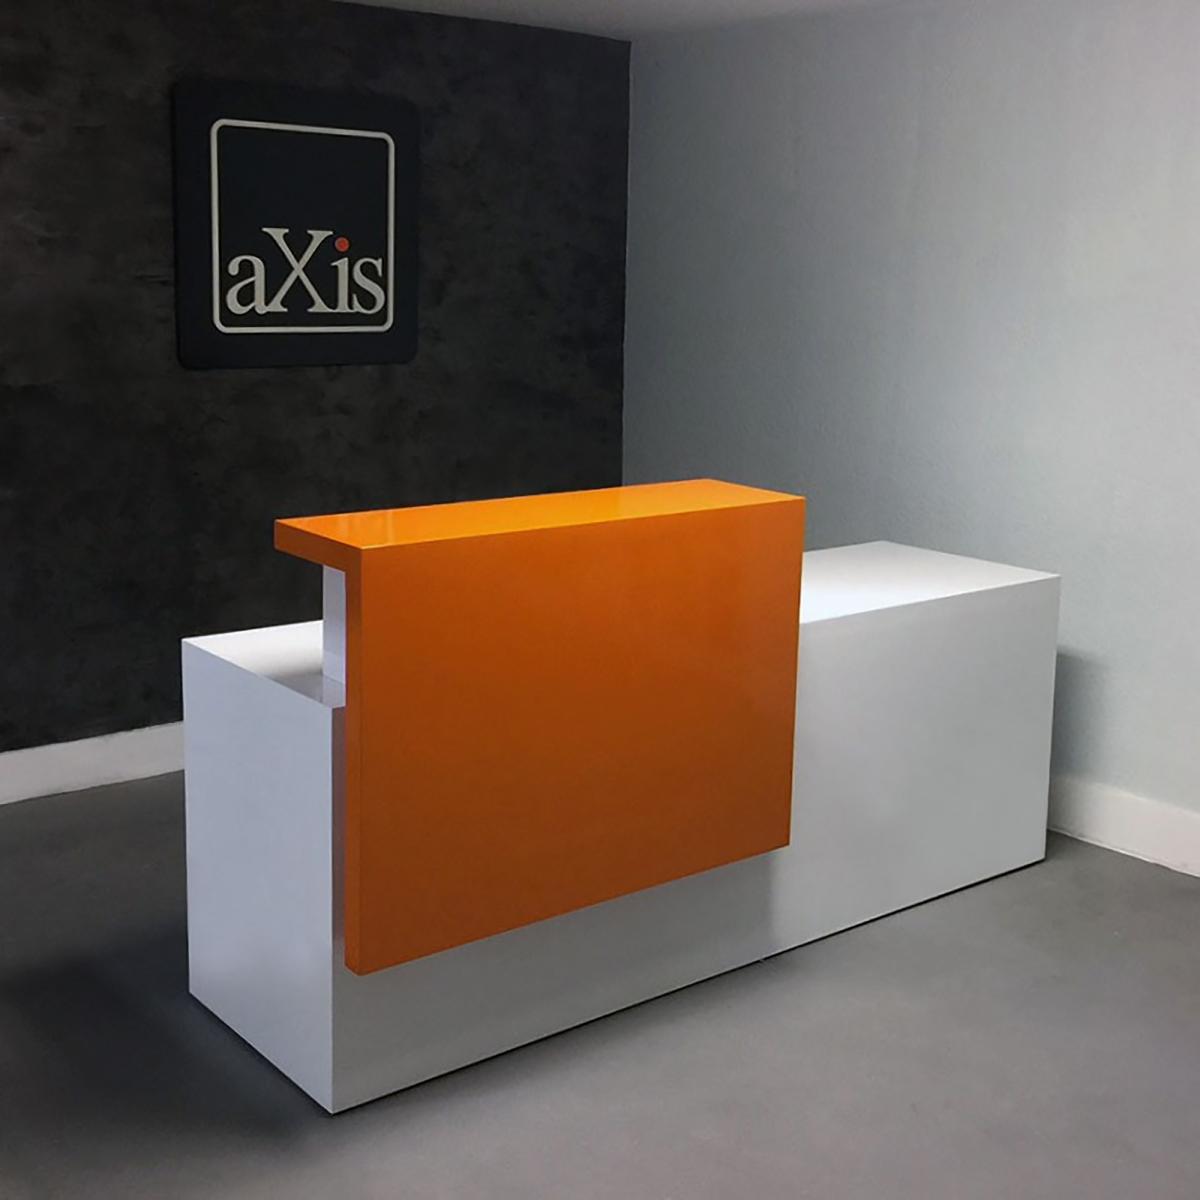 Los Angeles Custom Reception Desk